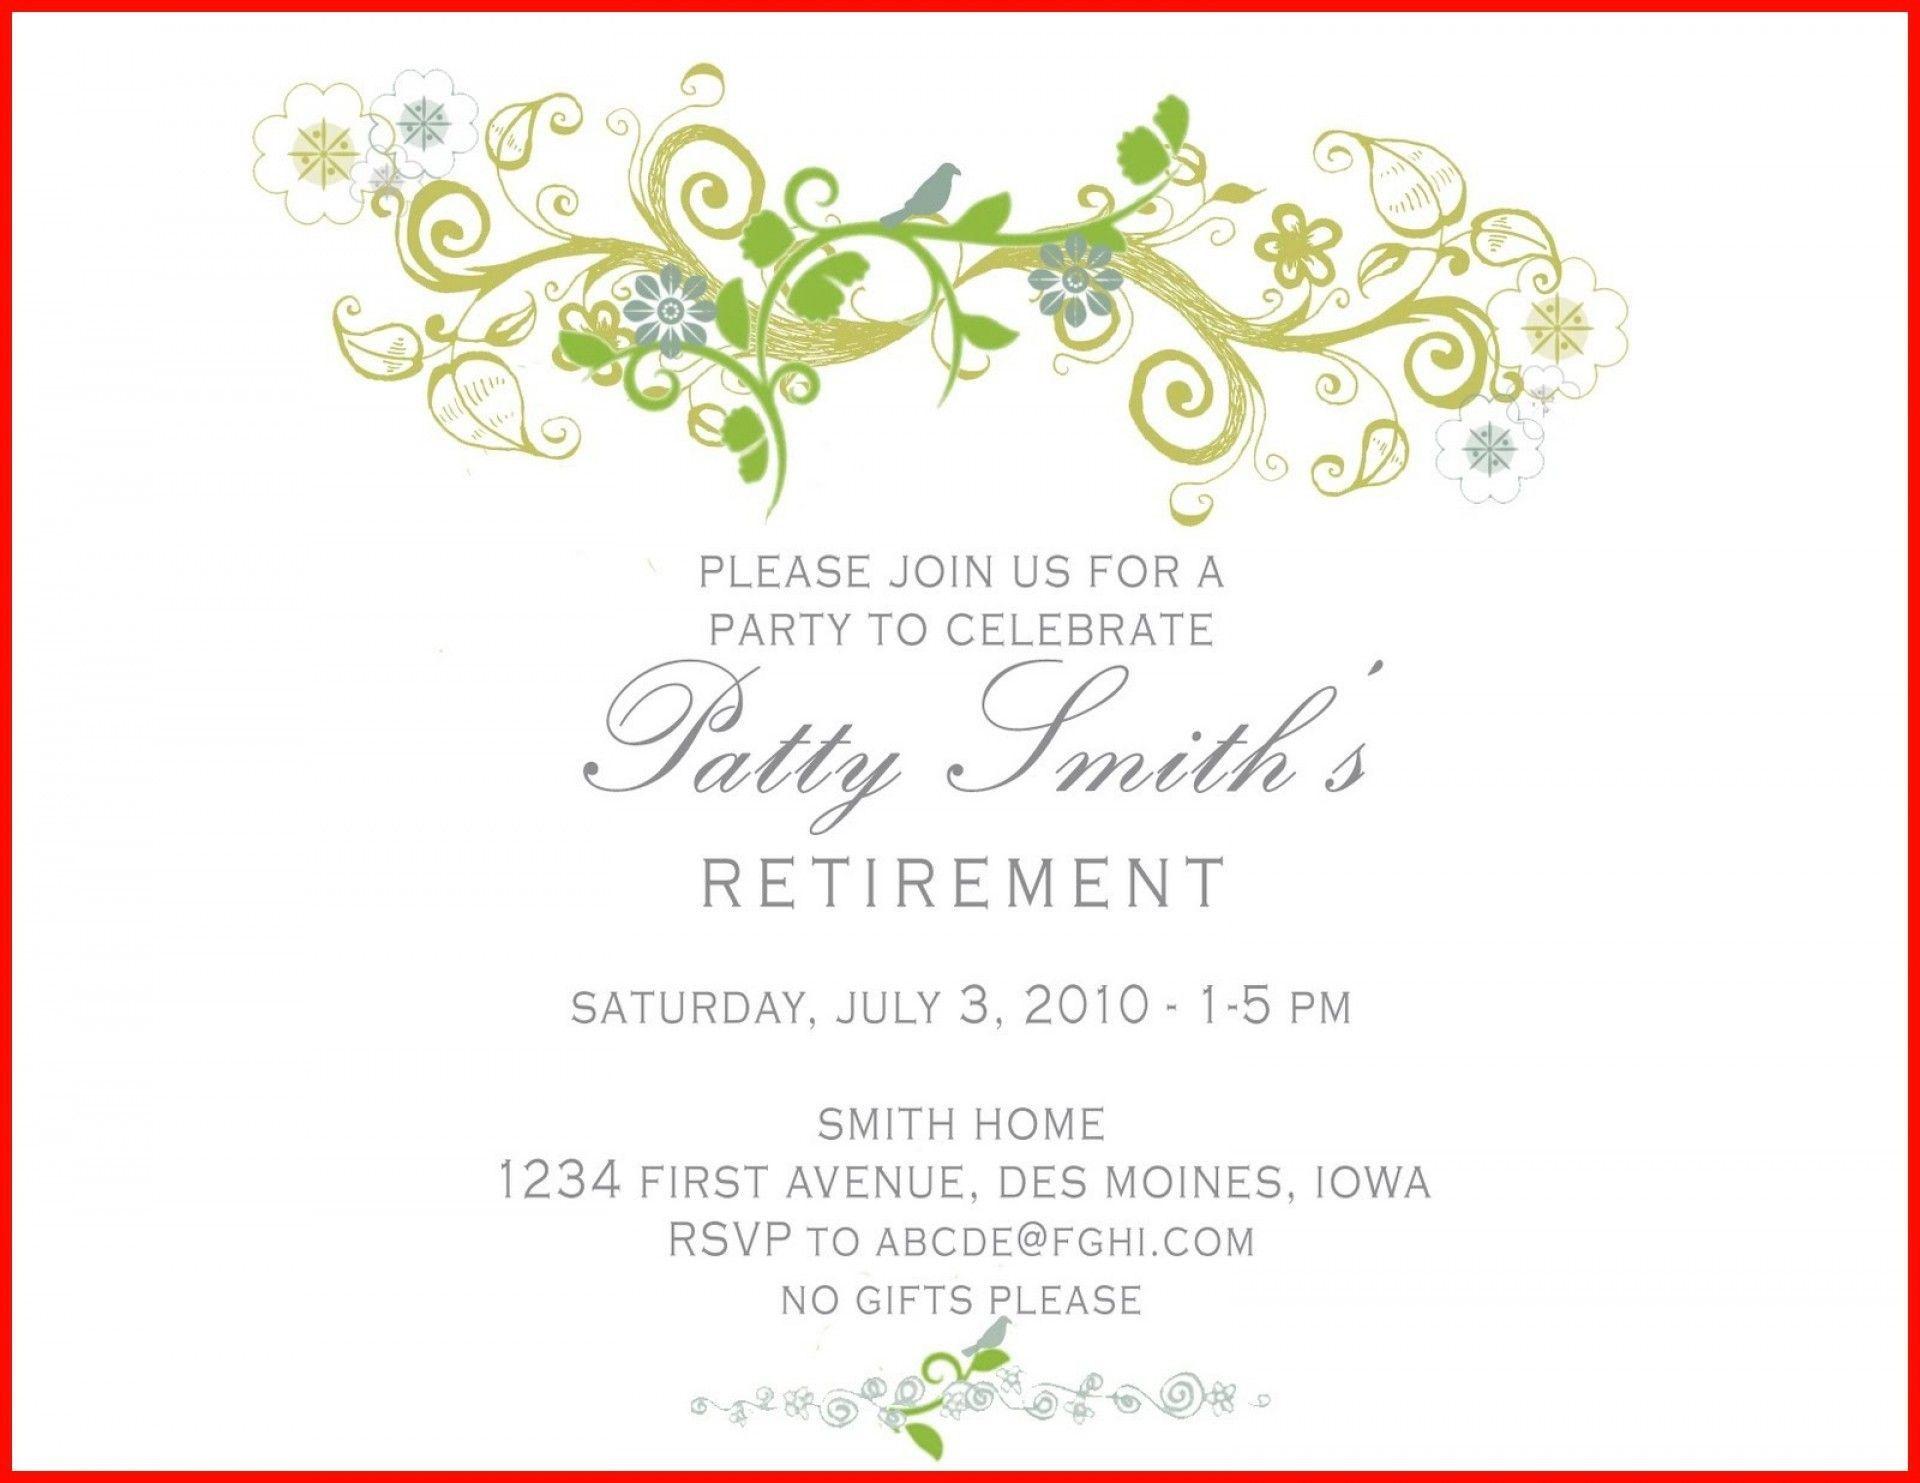 000 Impressive Retirement Party Invite Template High Definition  Invitation Online M Word FreeFull